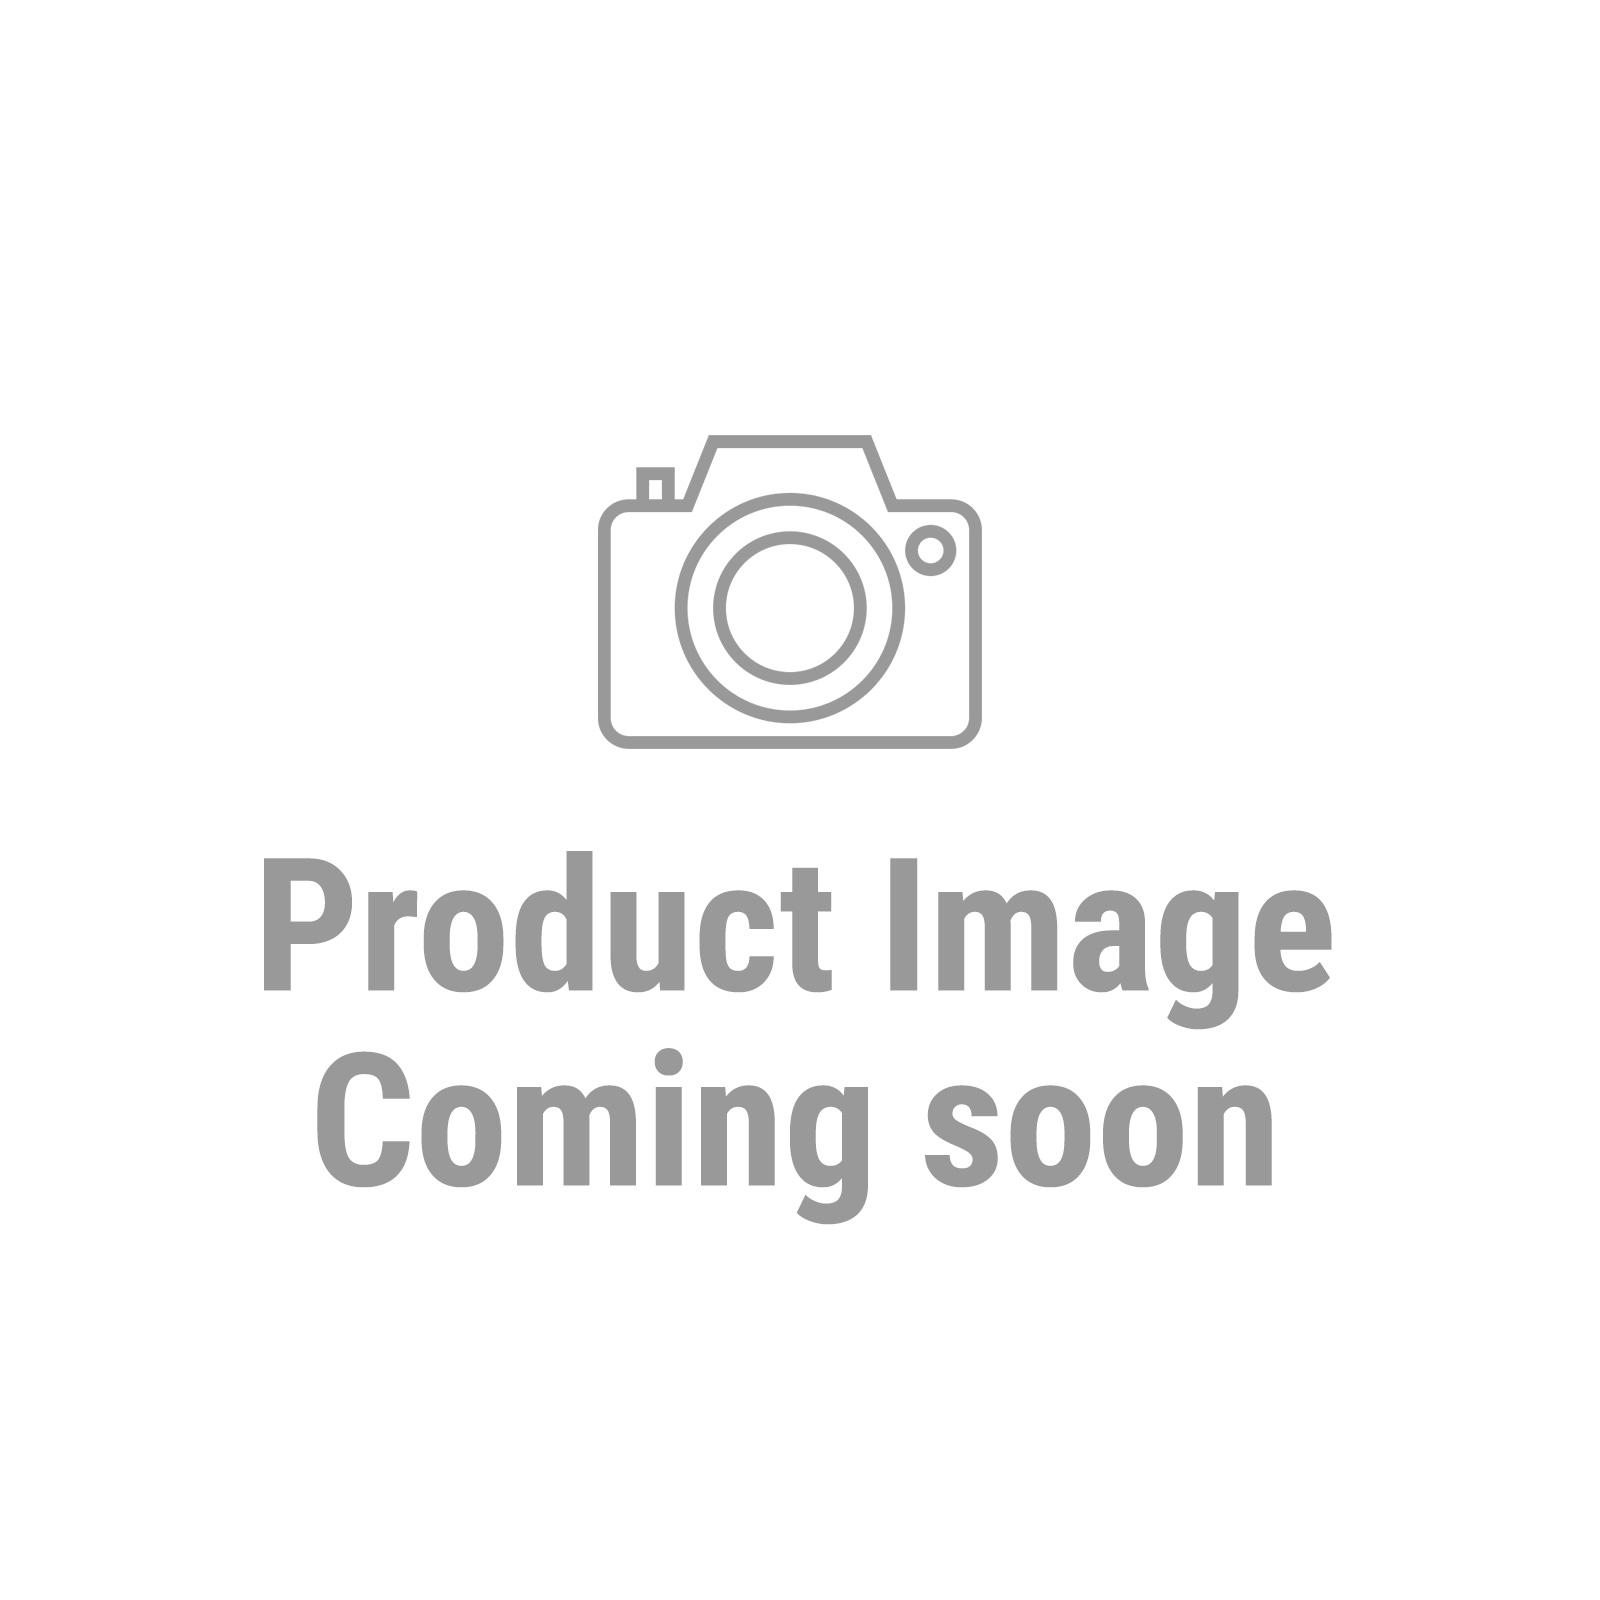 Truma Mover Smart M SET   1800Kg   halbautomatisch   13%   Trennschalter Sika